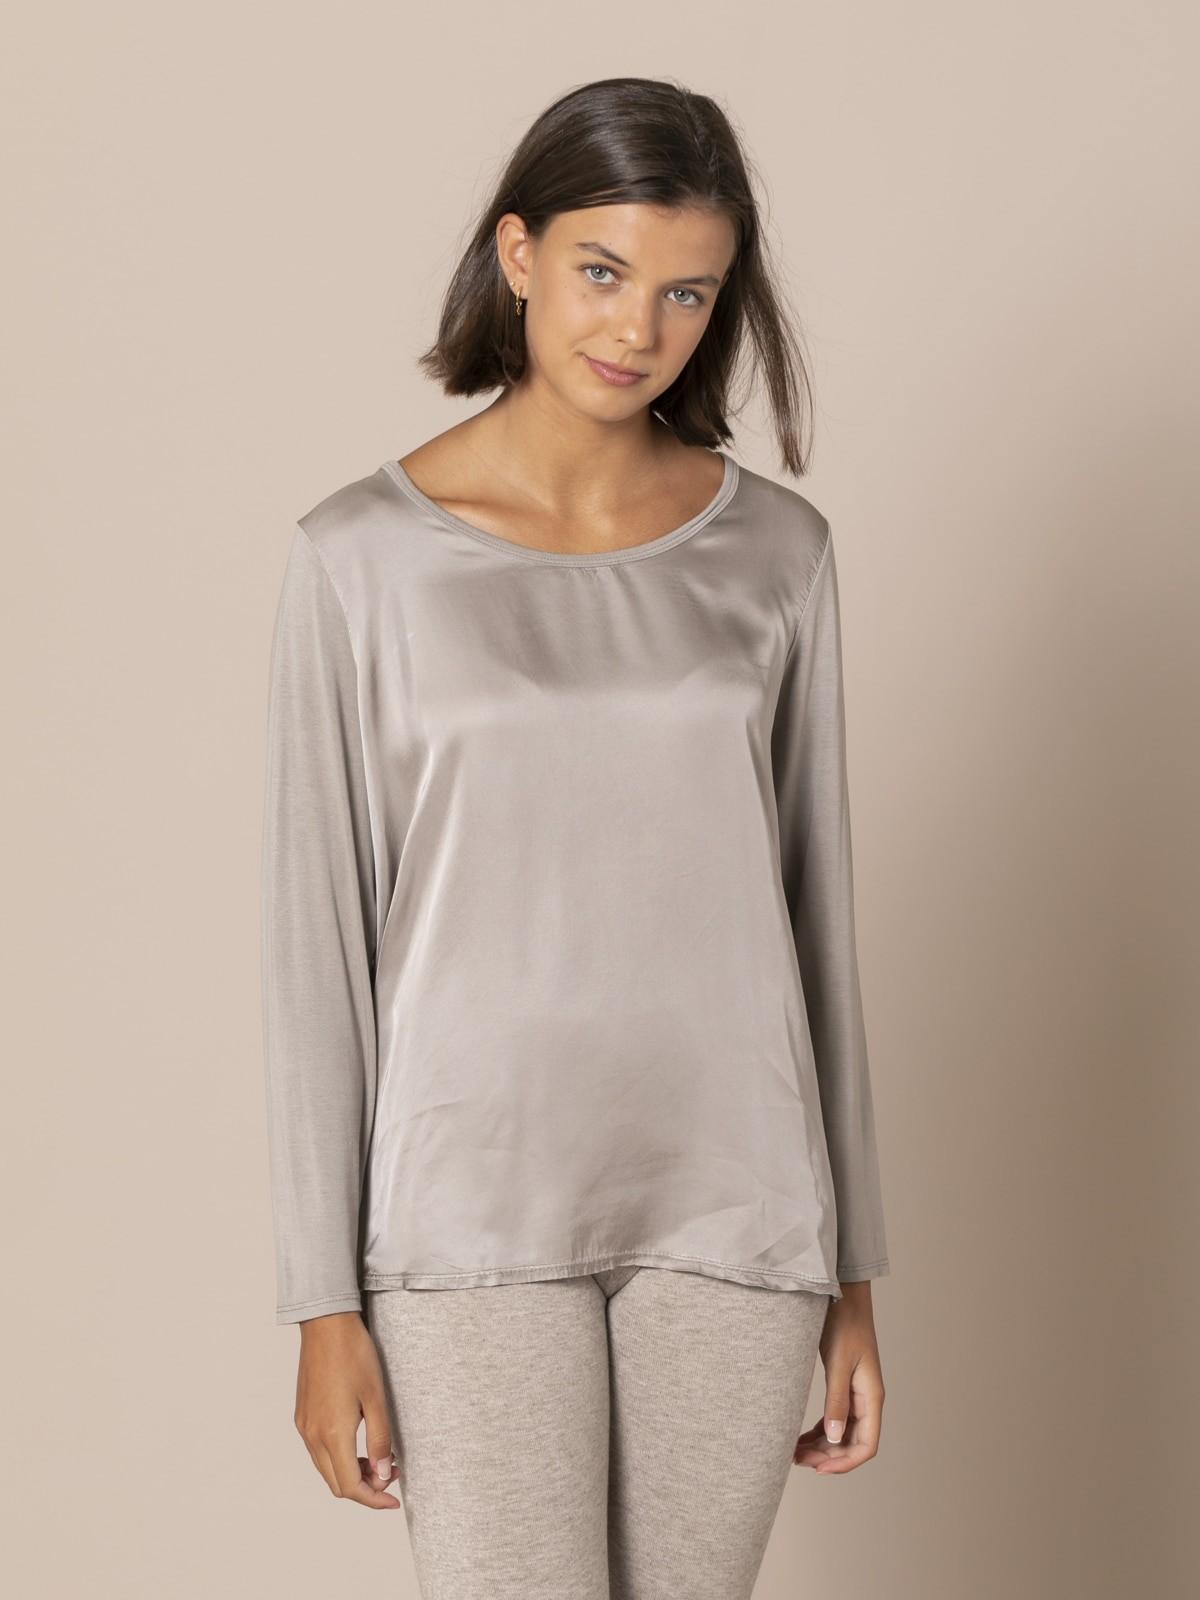 Camiseta mujer fluida manga larga Piedra